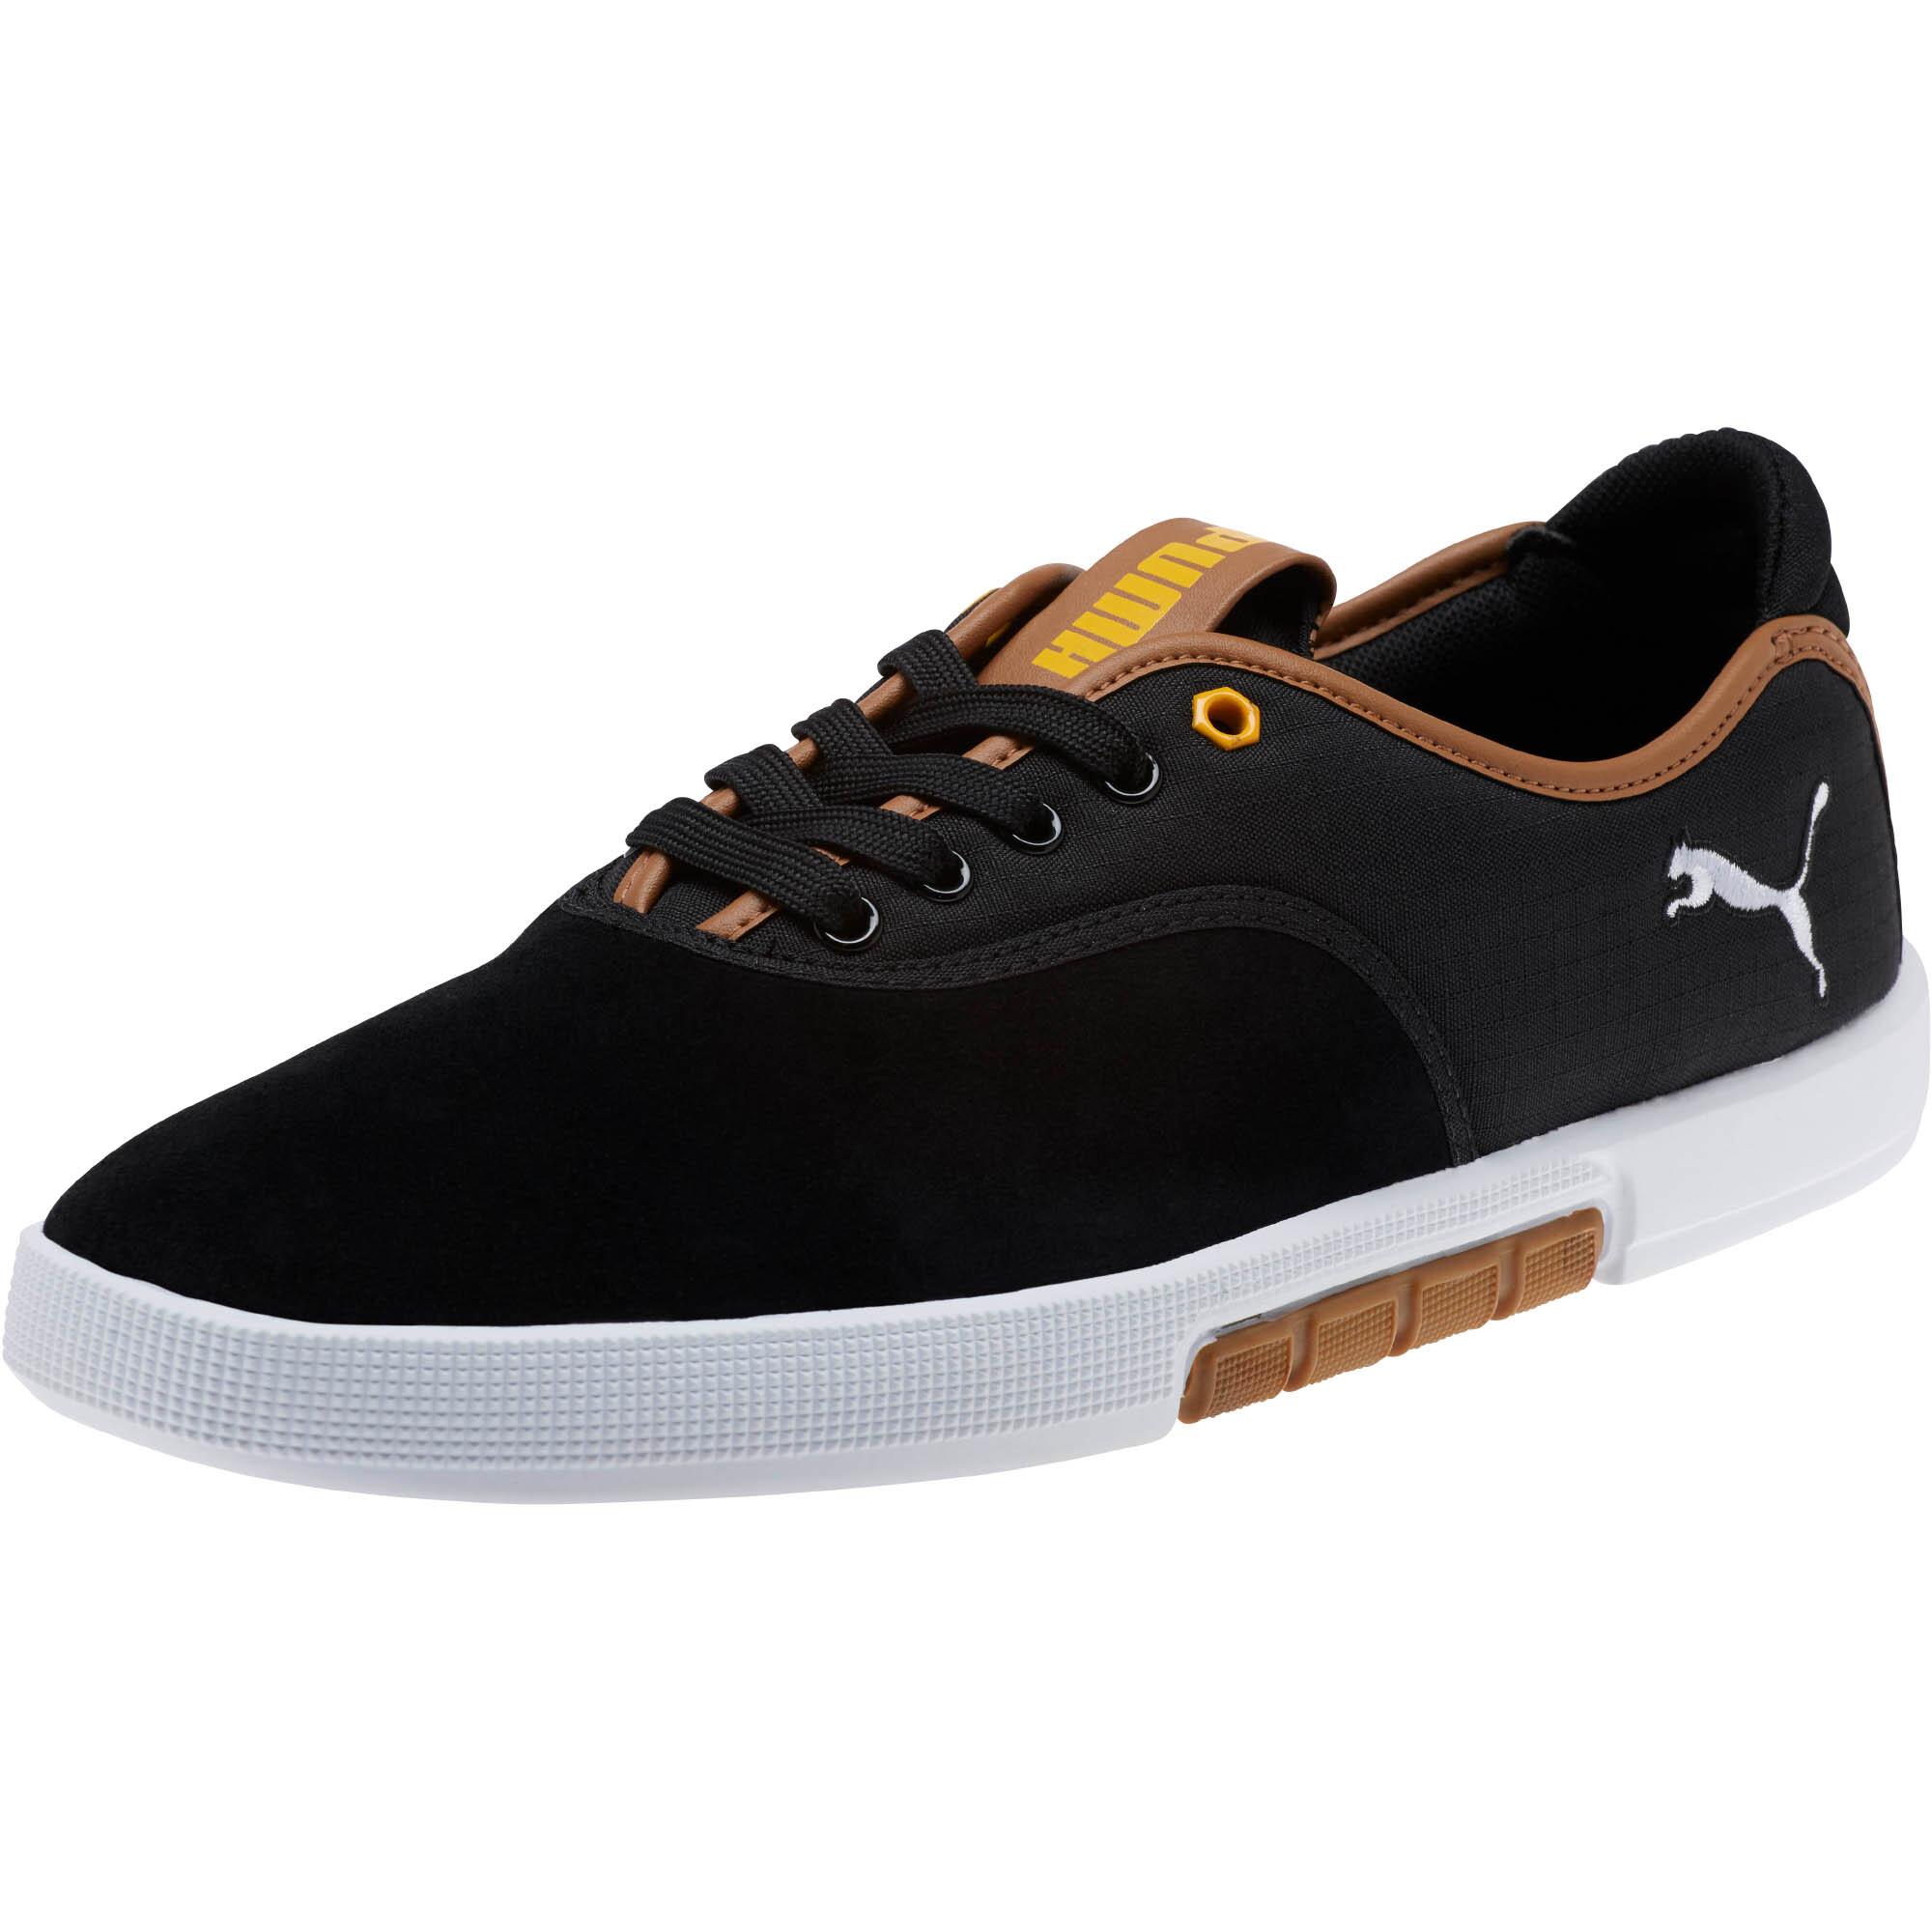 PUMA-Funist-Lo-MU-Men-039-s-Sneakers-Men-Shoe-Evolution thumbnail 4